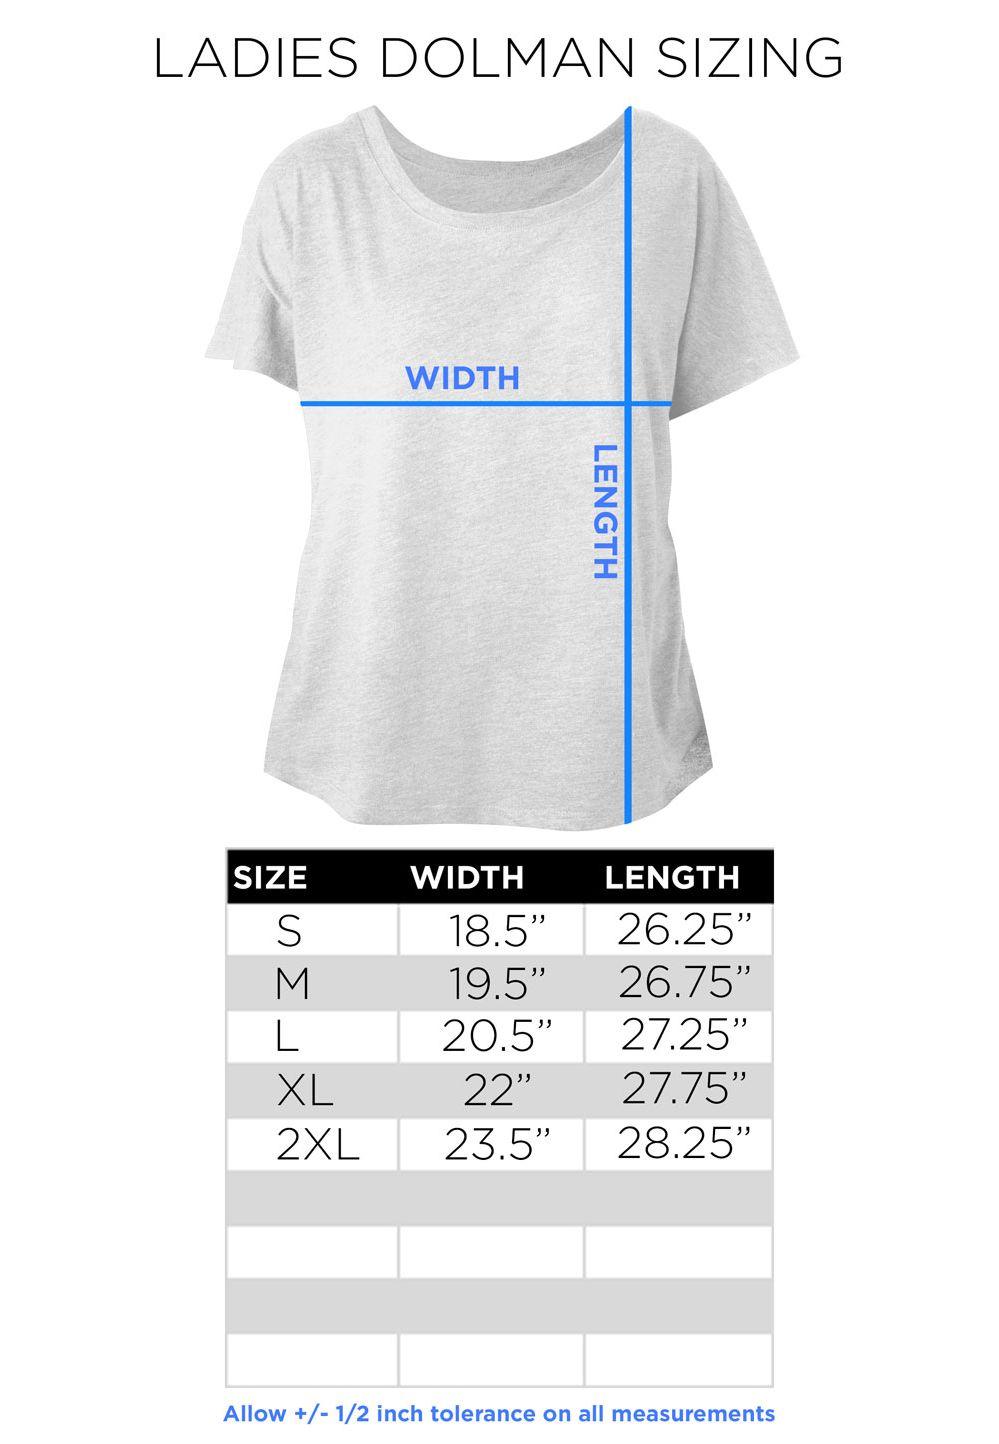 ac-women-s-dolman-size-chart-2.jpg